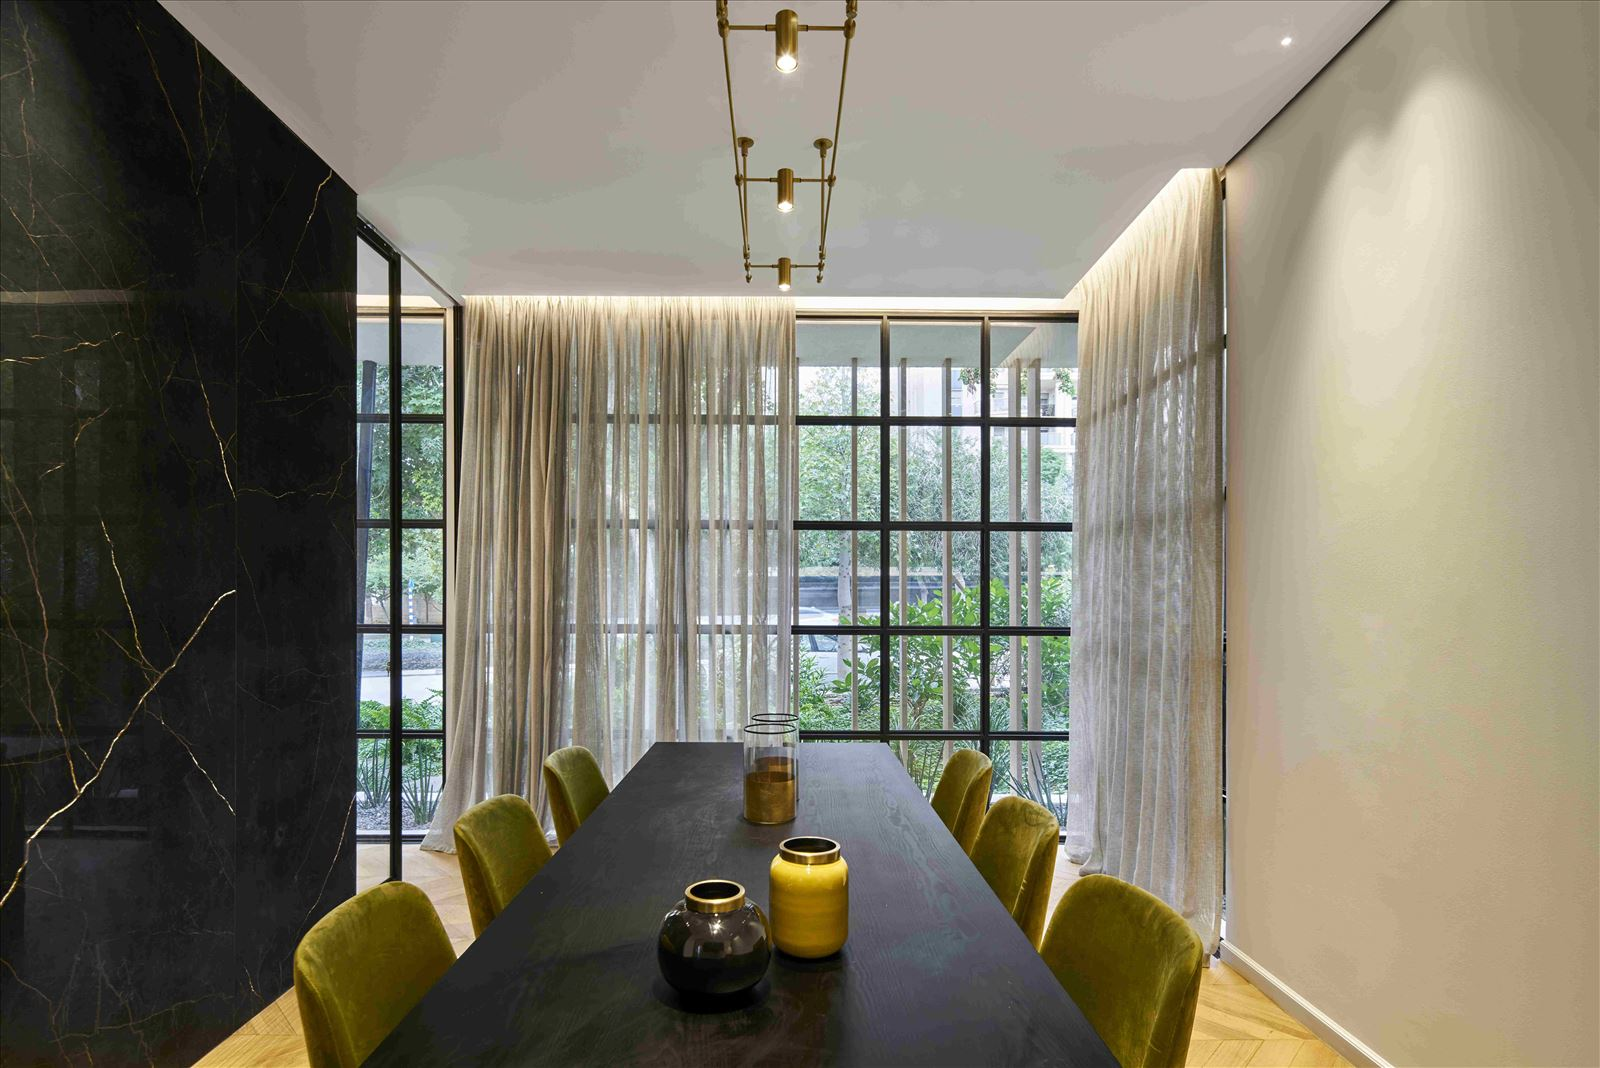 sales office - onone תאורה אדריכלית על ידי דורי קמחי